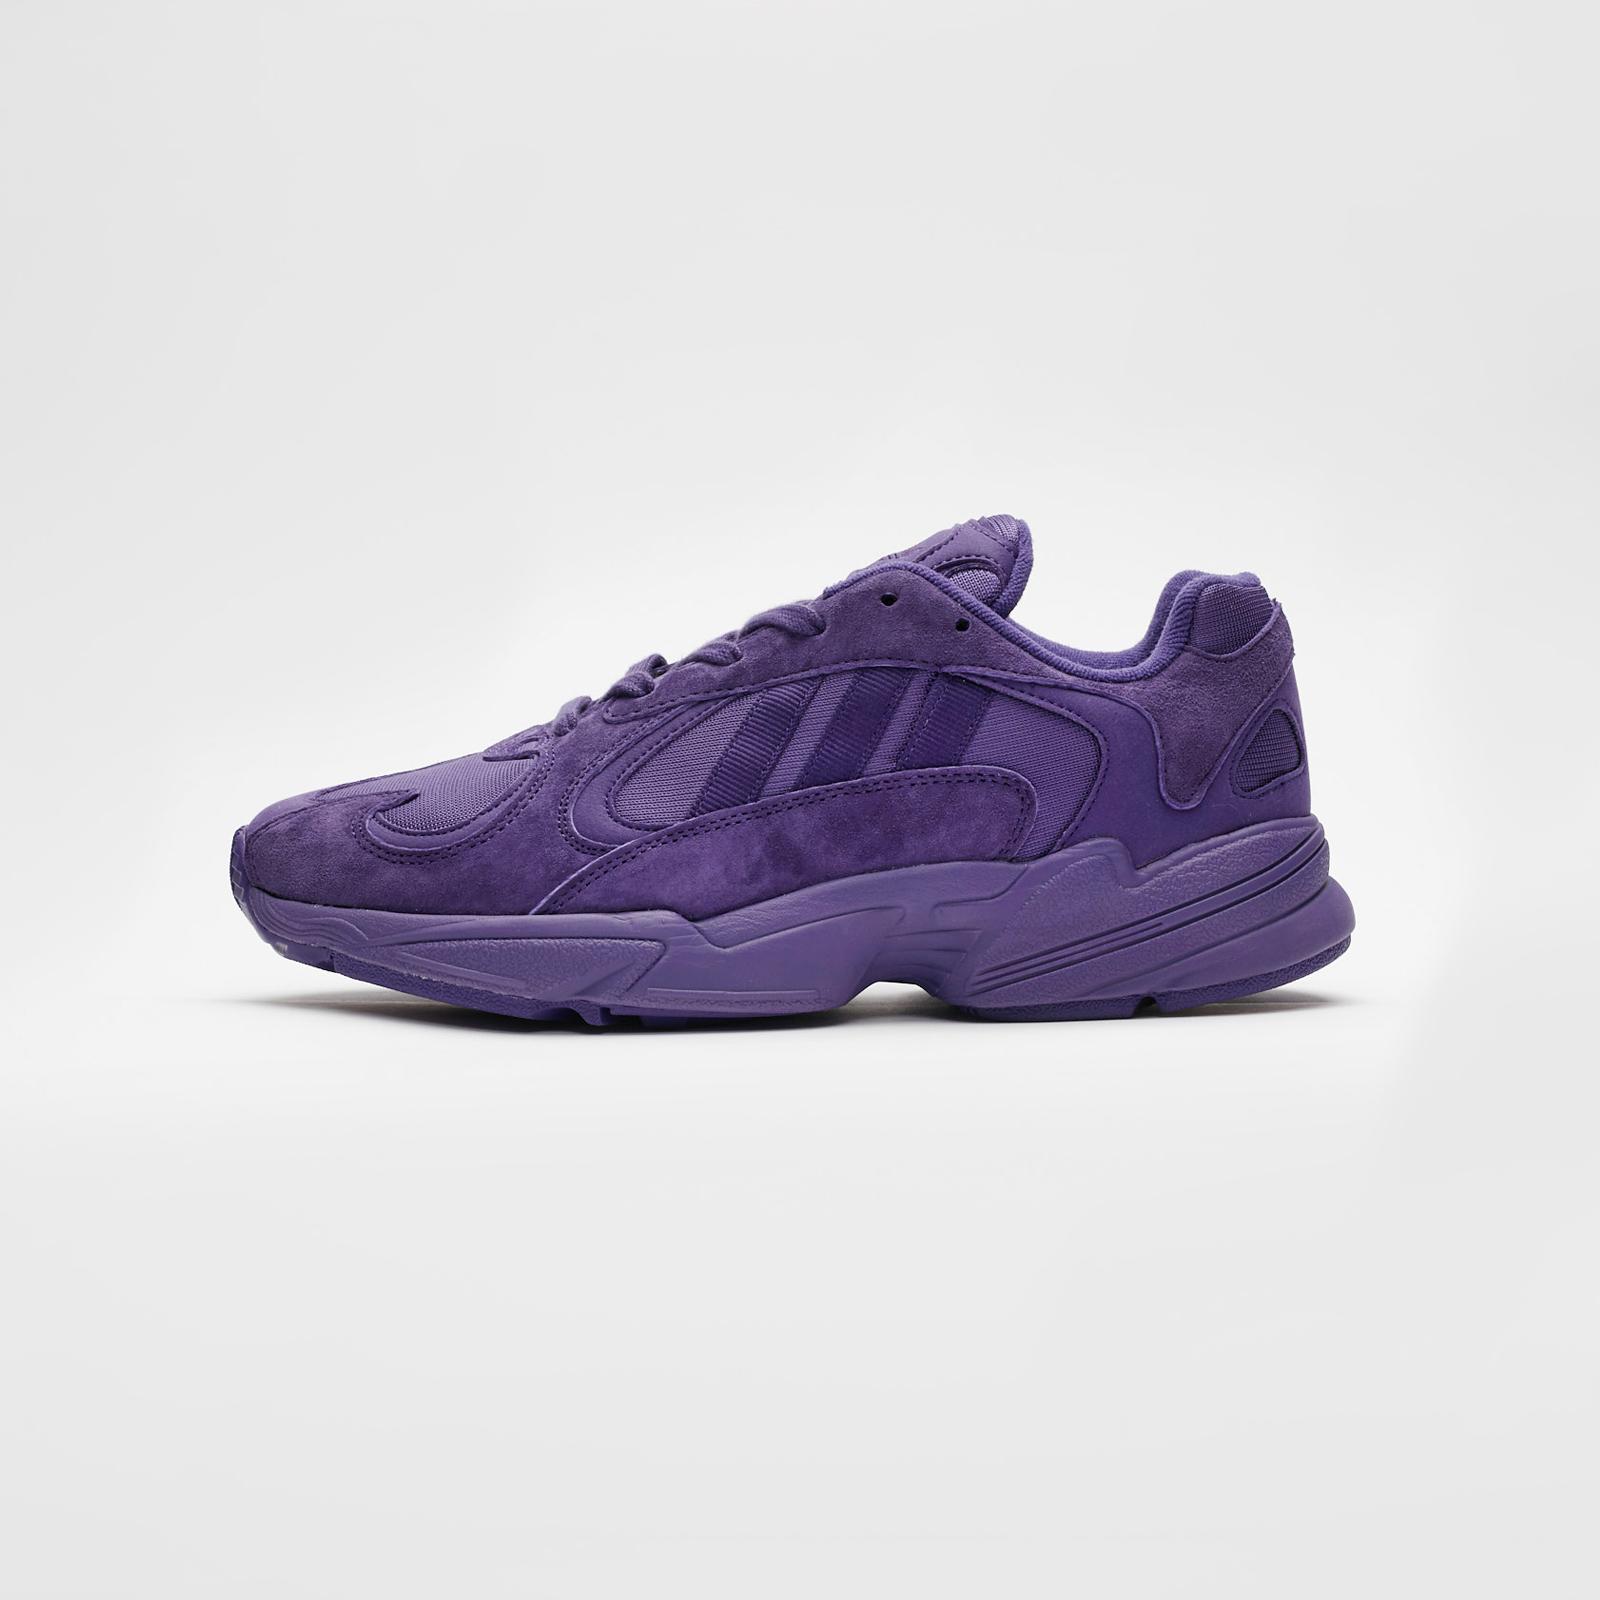 low priced 7f818 834d6 adidas Yung 1 - F37071 - Sneakersnstuff   sneakers   streetwear online  since 1999